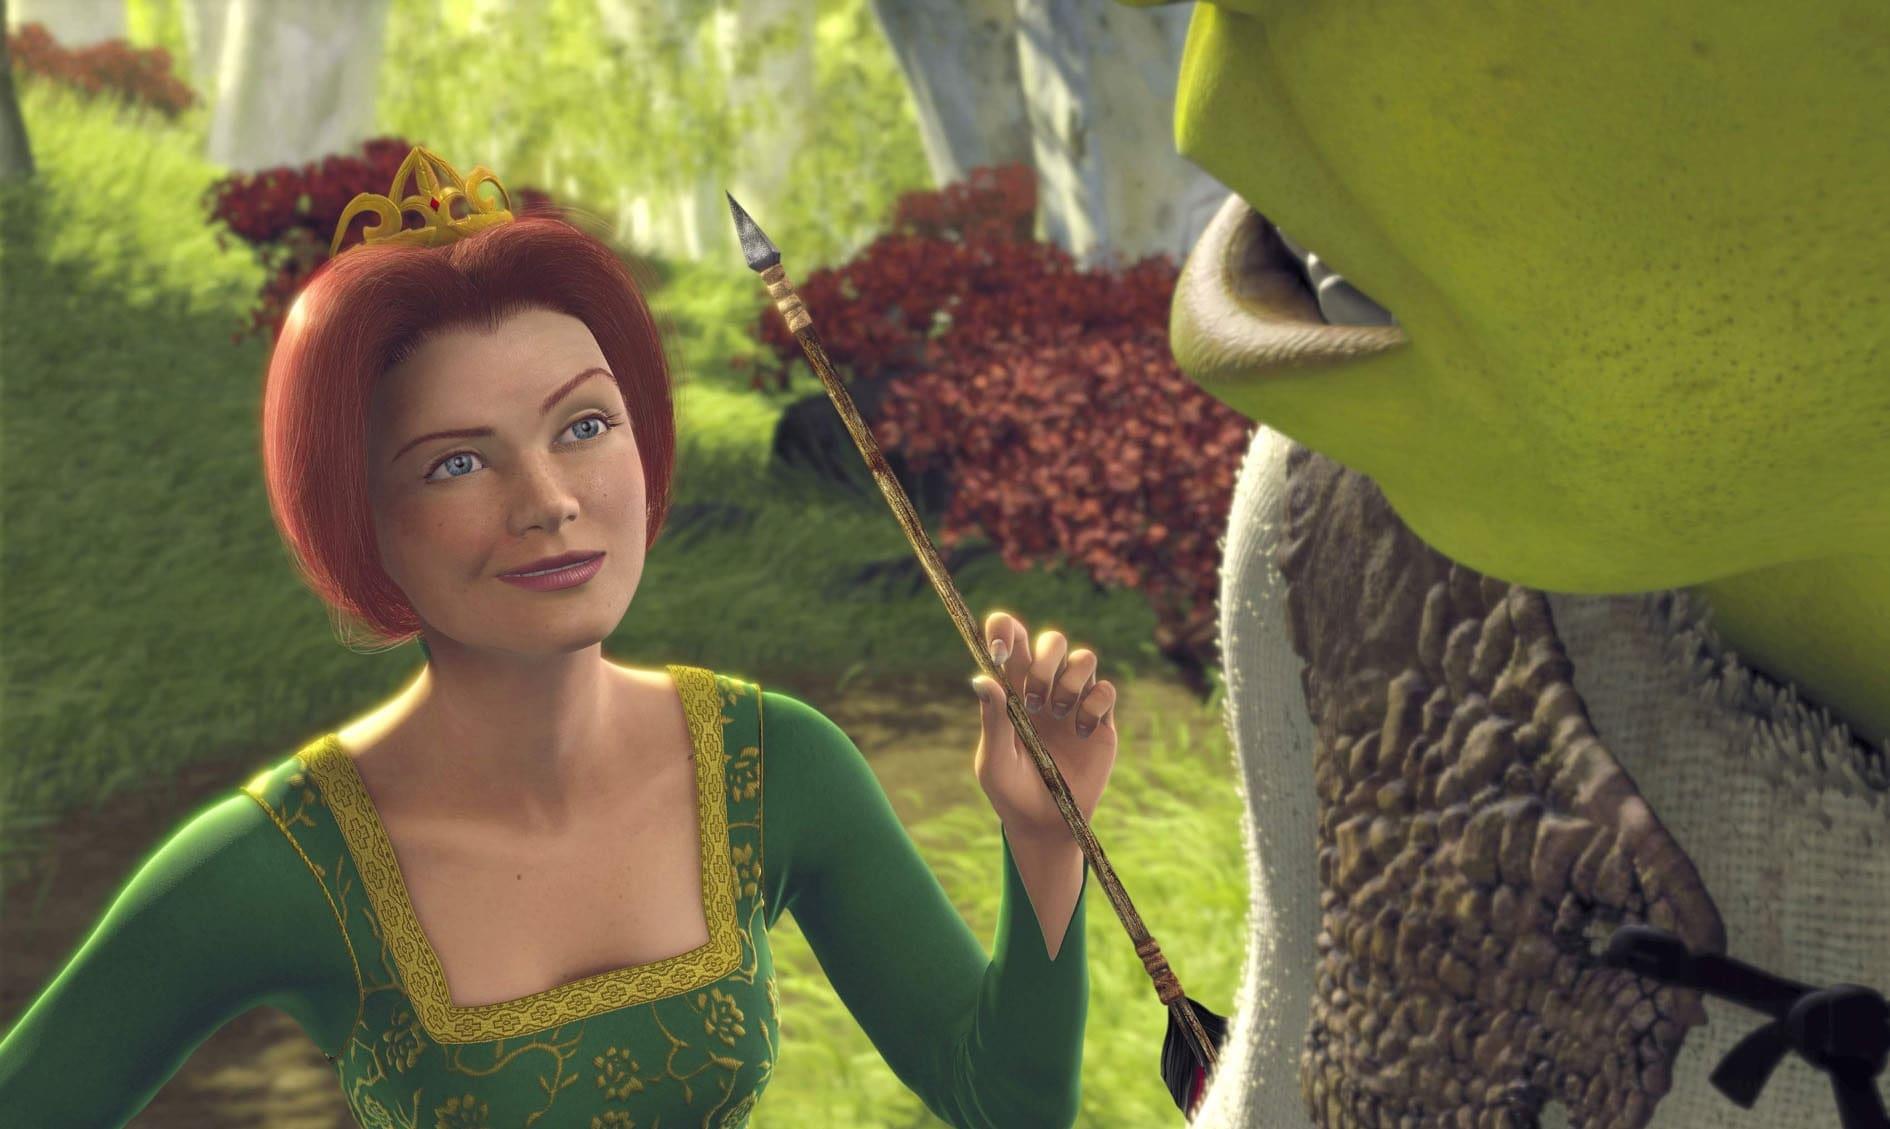 Cameron Diaz voices Princess Fiona in Shrek